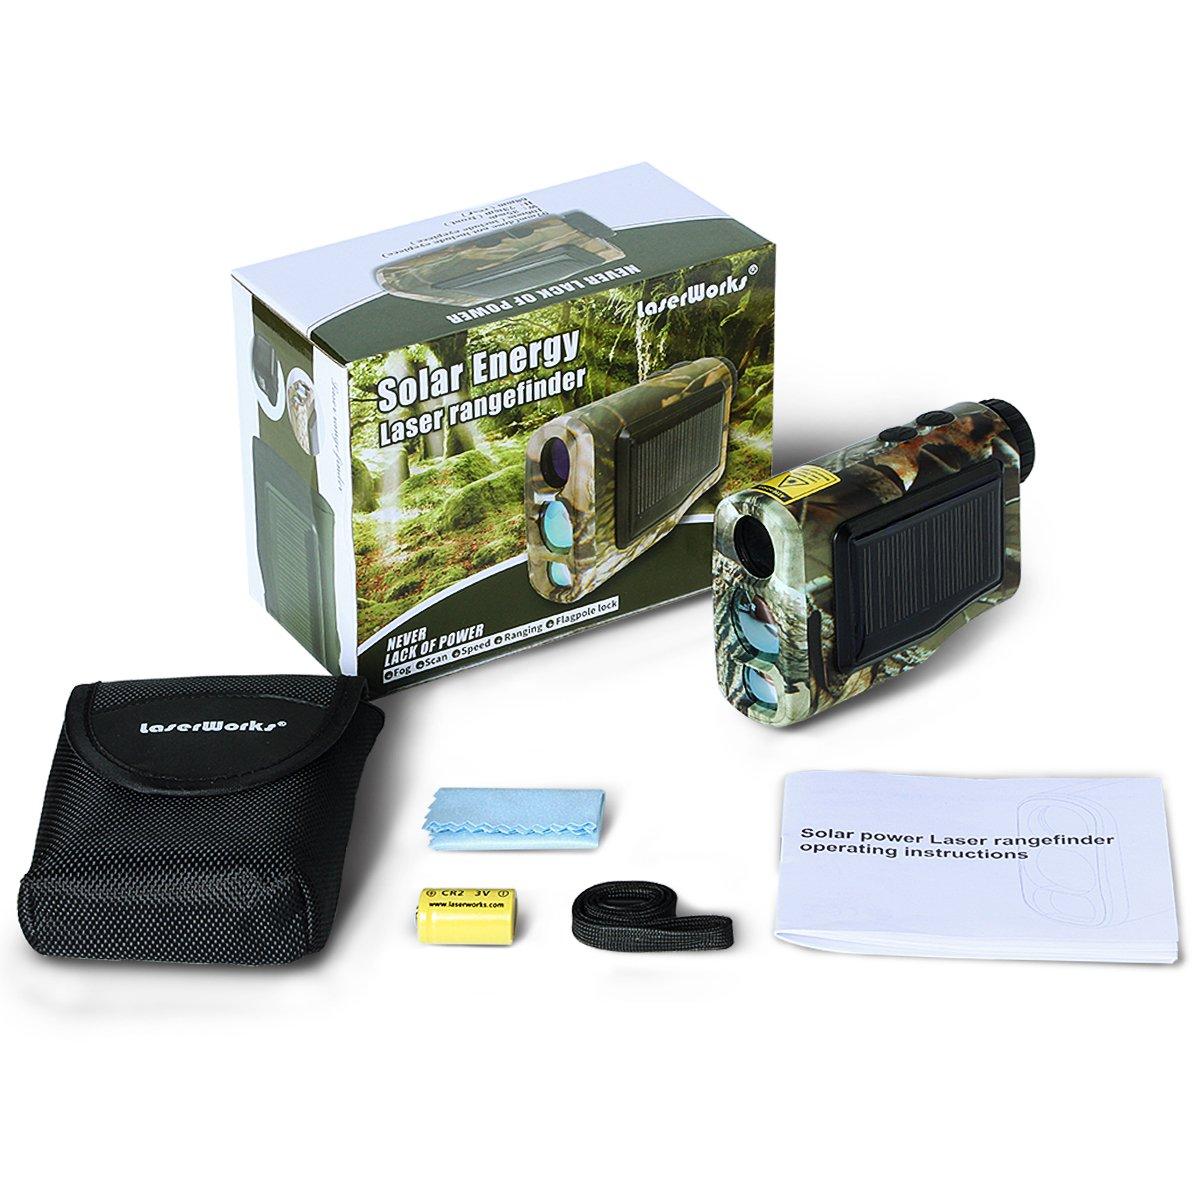 LaserWorks 600m Solar Power Laser Rangefinder for Hunting Golf,Fog measurement,Waterproof (Camouflage) by LaserWorks